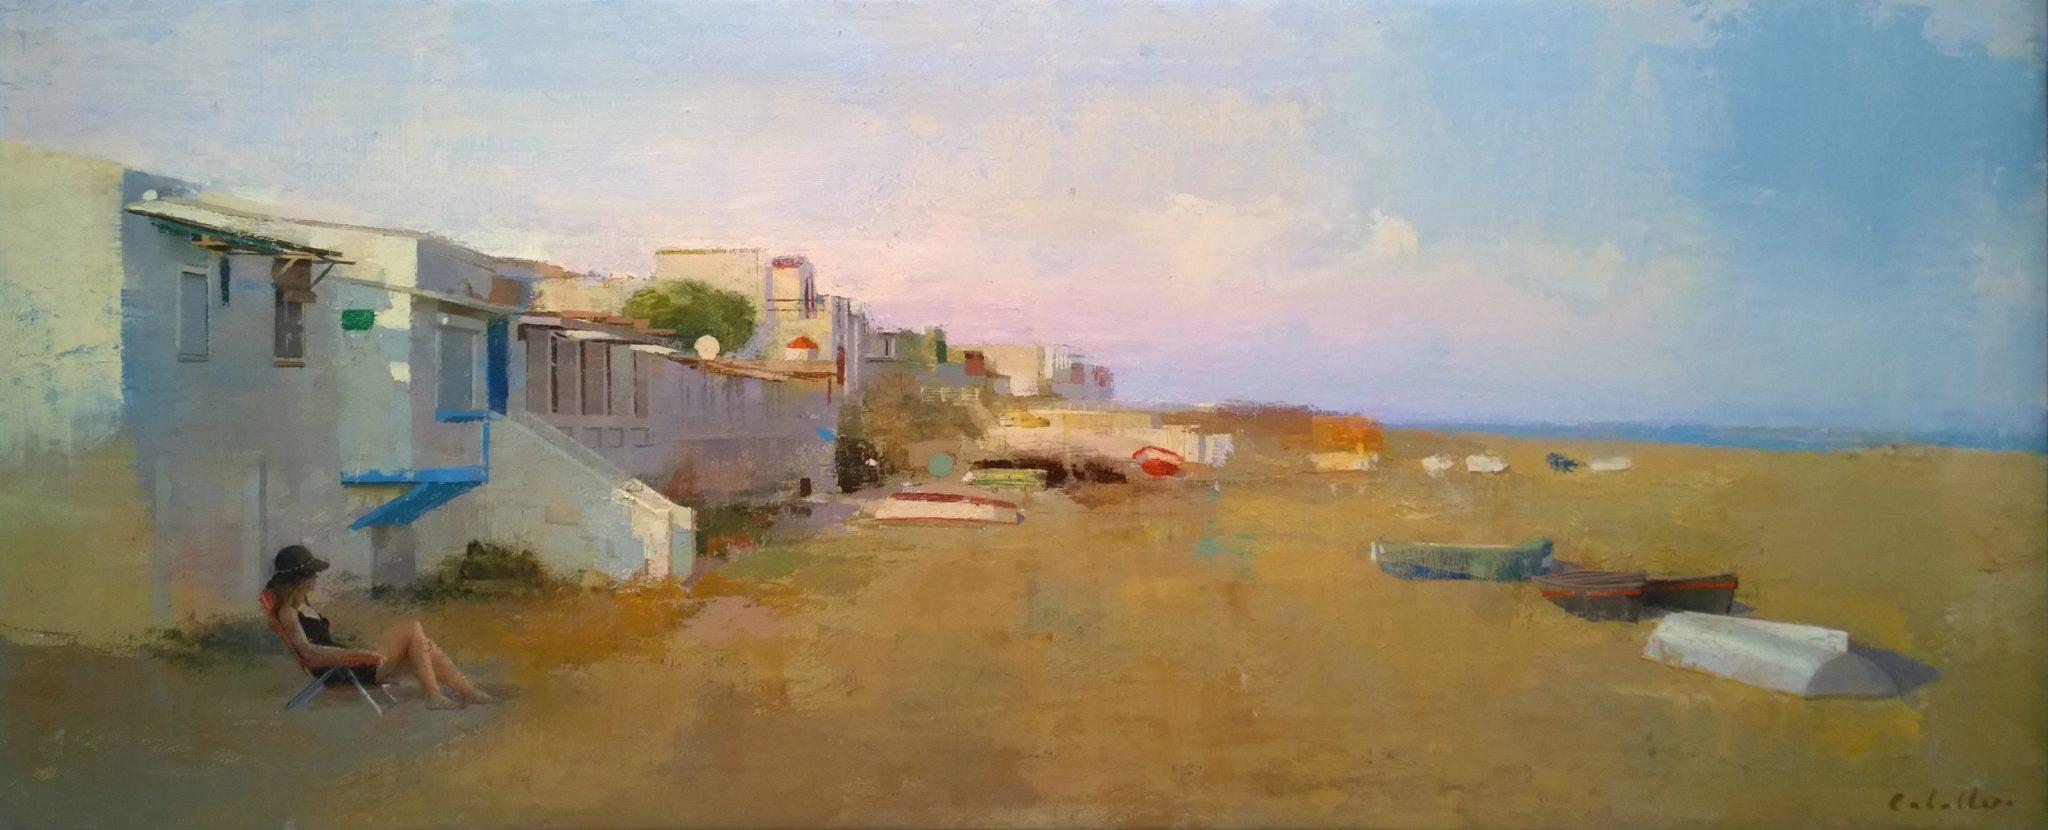 calma-alejandra-caballero-oleo-paisaje-playa-mar-barcas-mujer-montgat